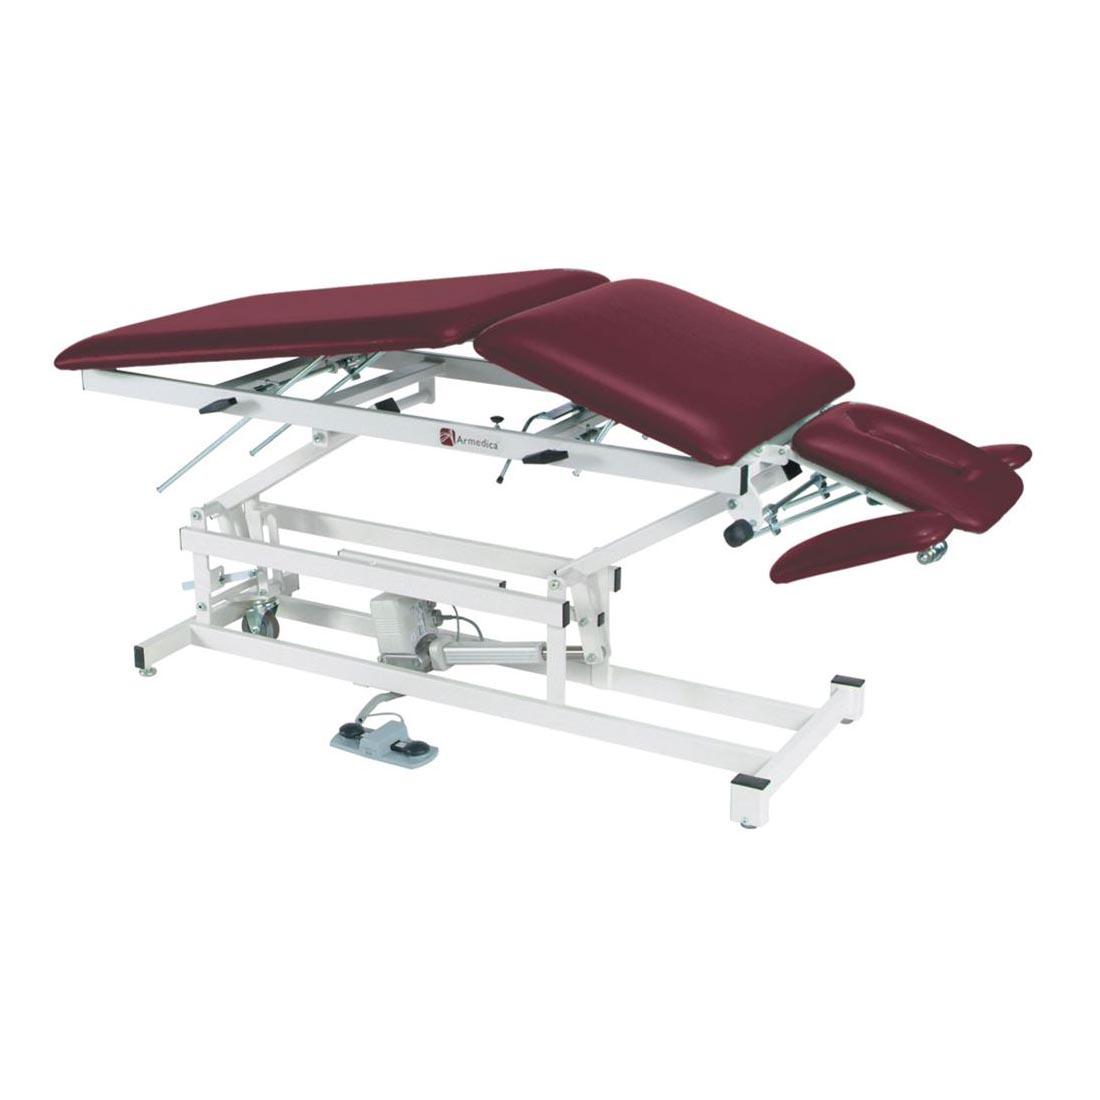 Armedica AM-500 treatment table